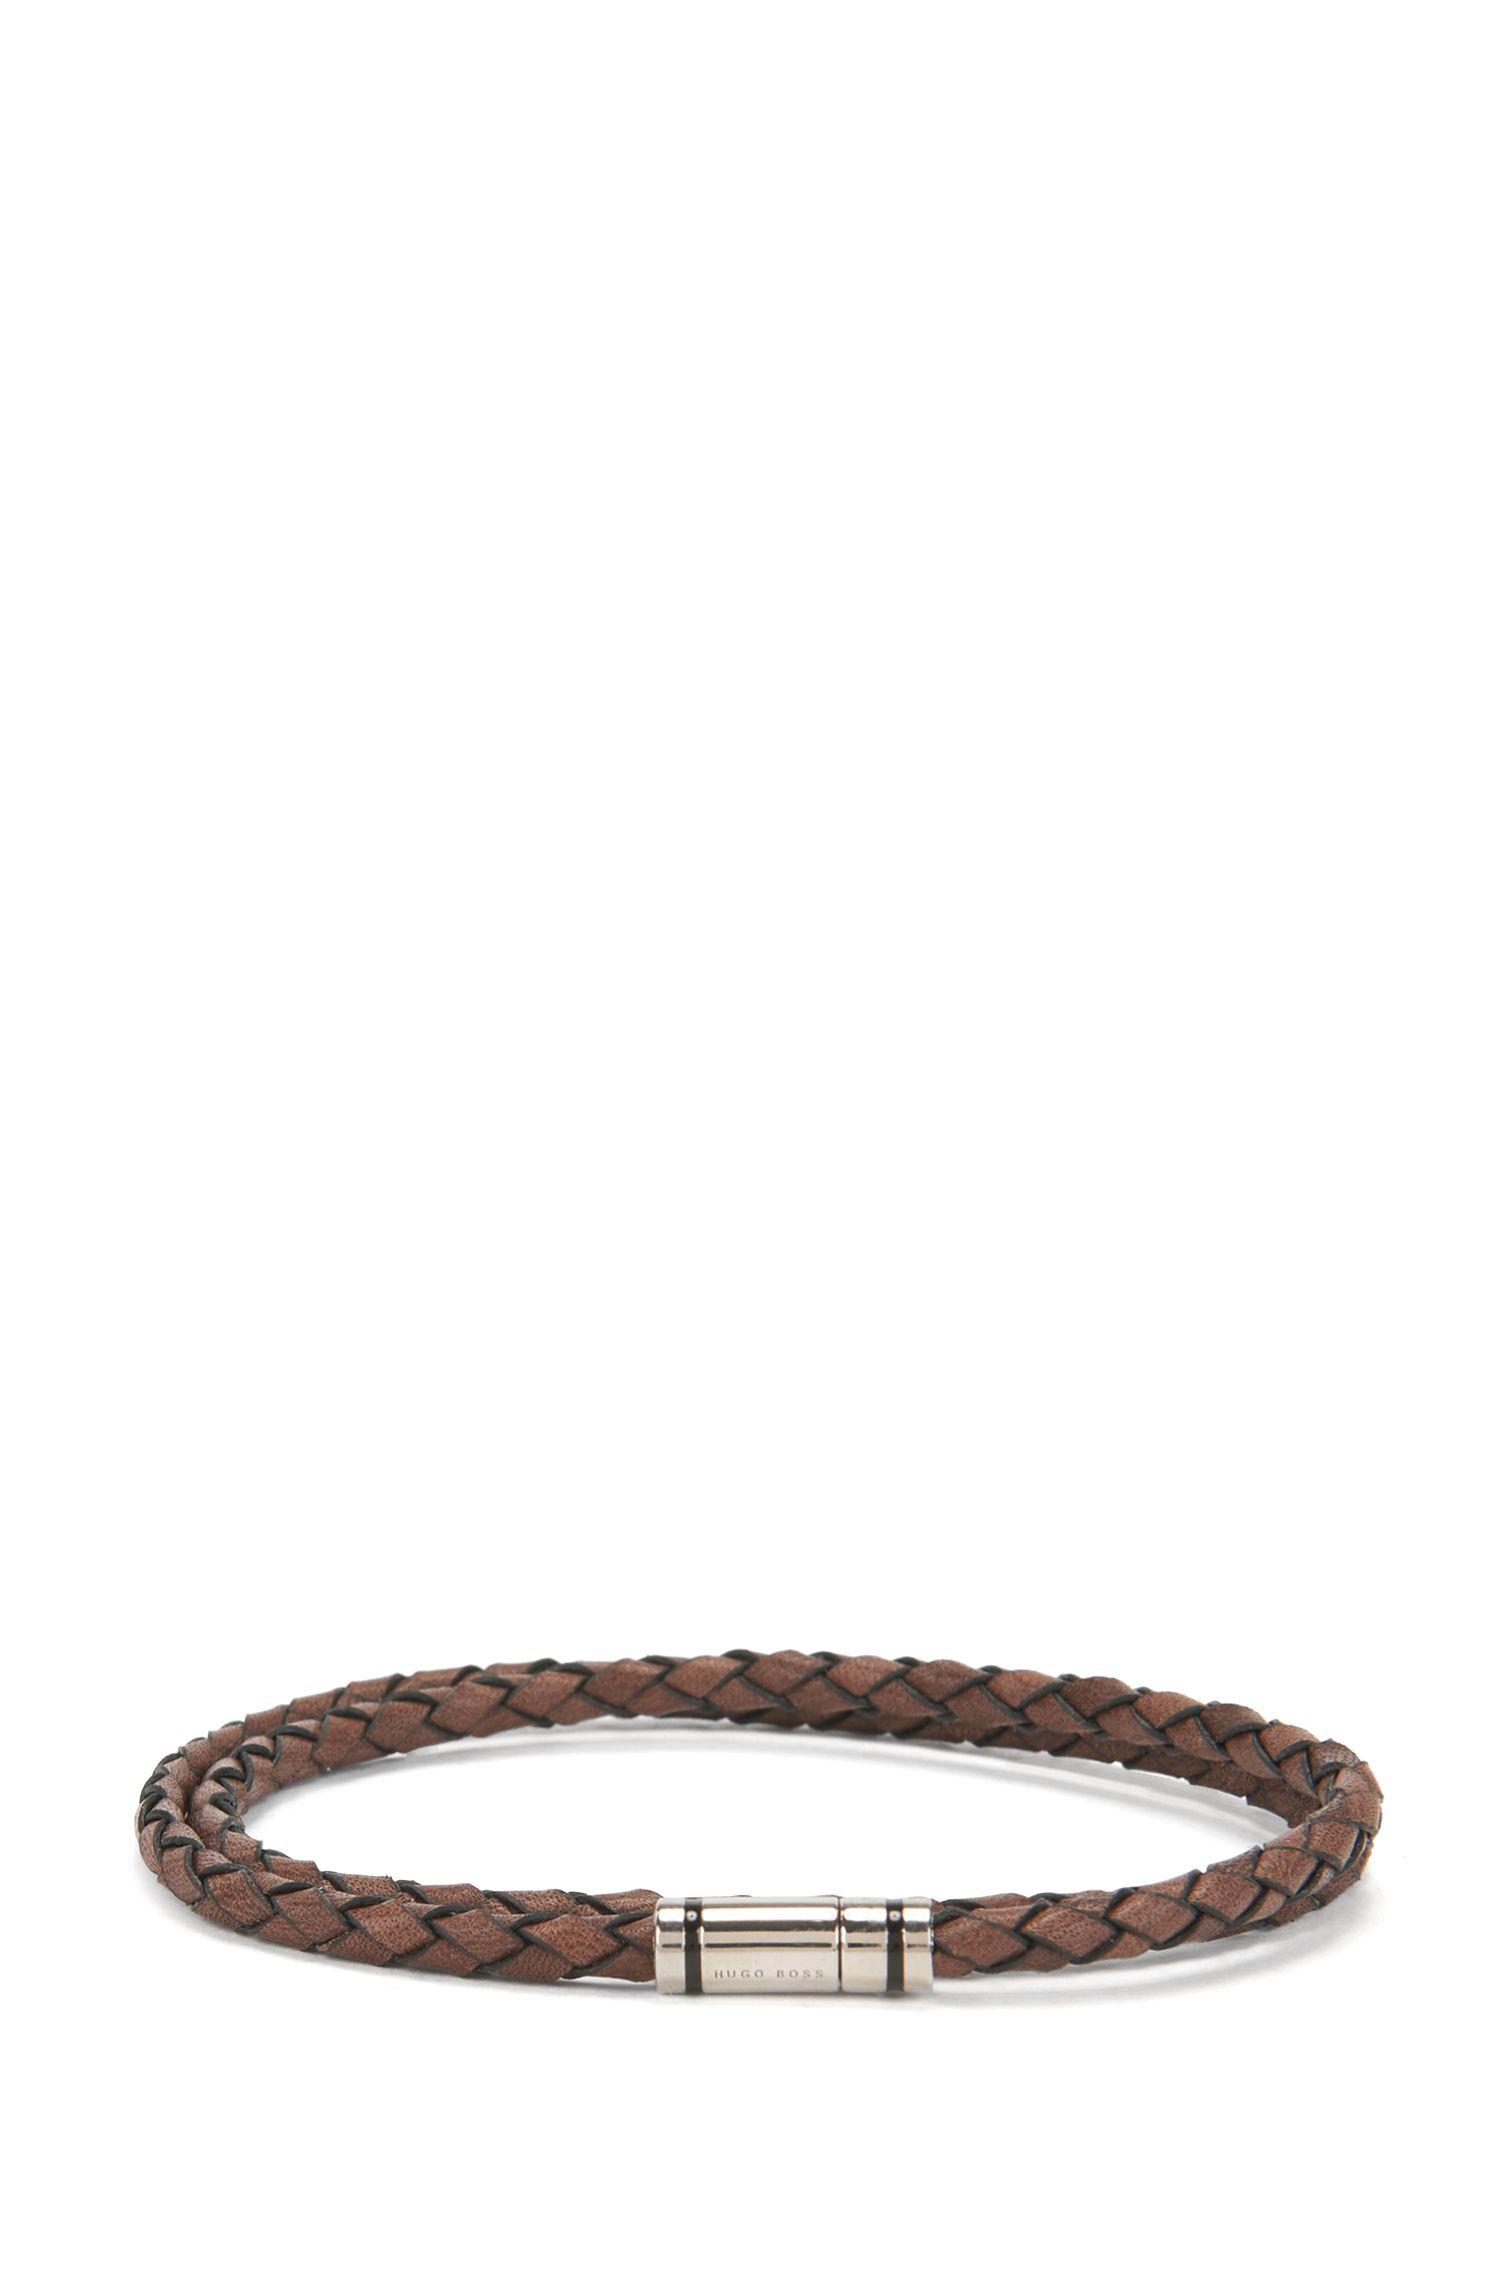 Braided leather bracelet with enamel-stripe snap closure